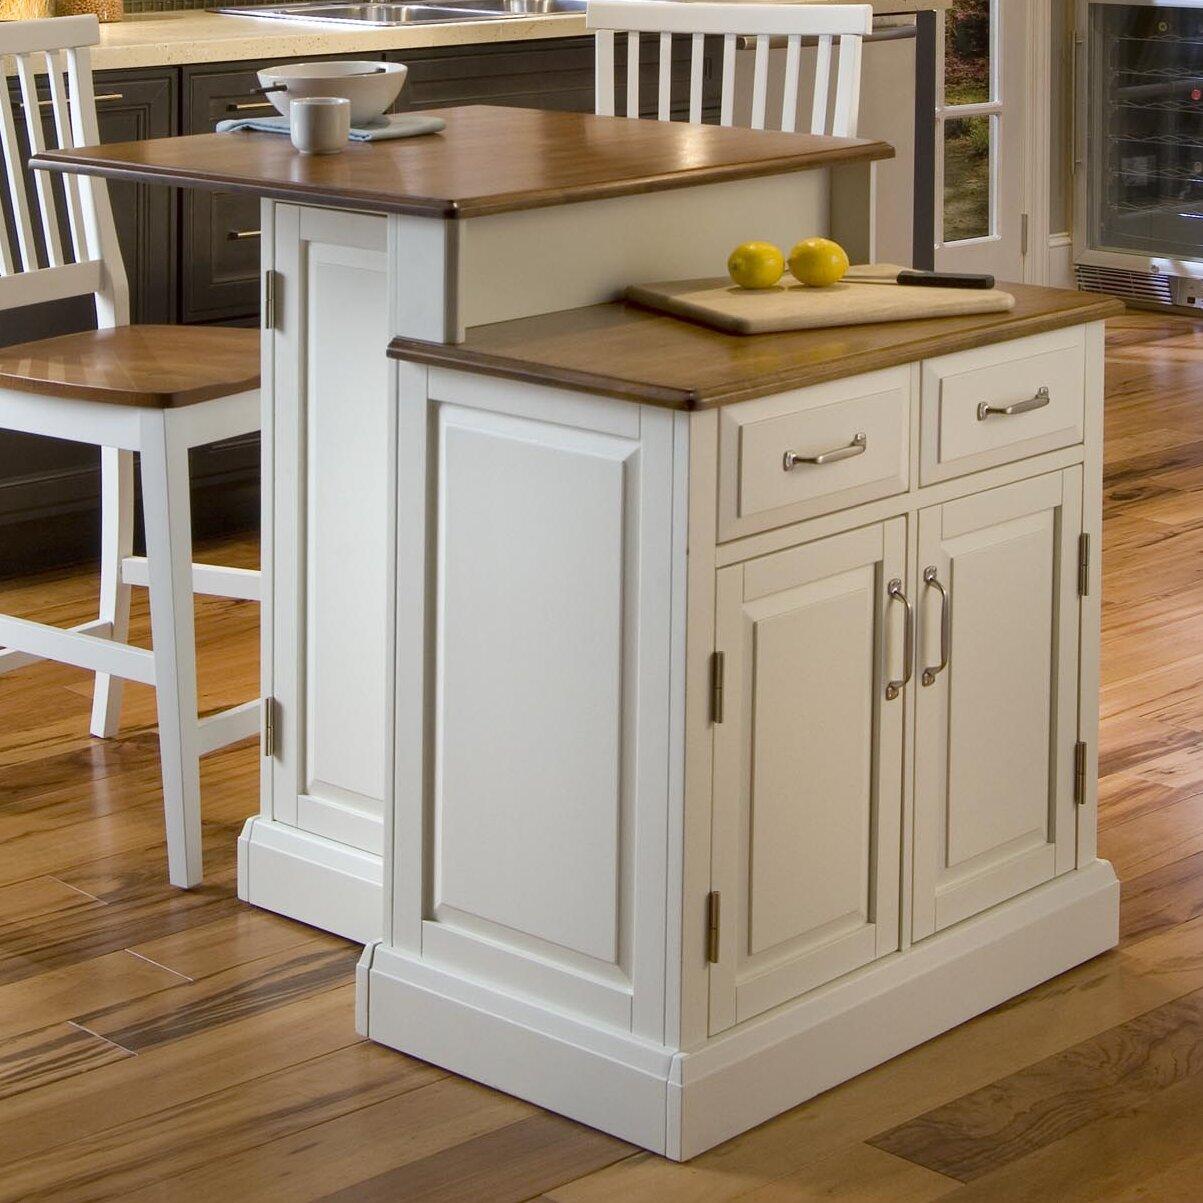 Home Styles Woodbridge 3 Piece Kitchen Island Set with